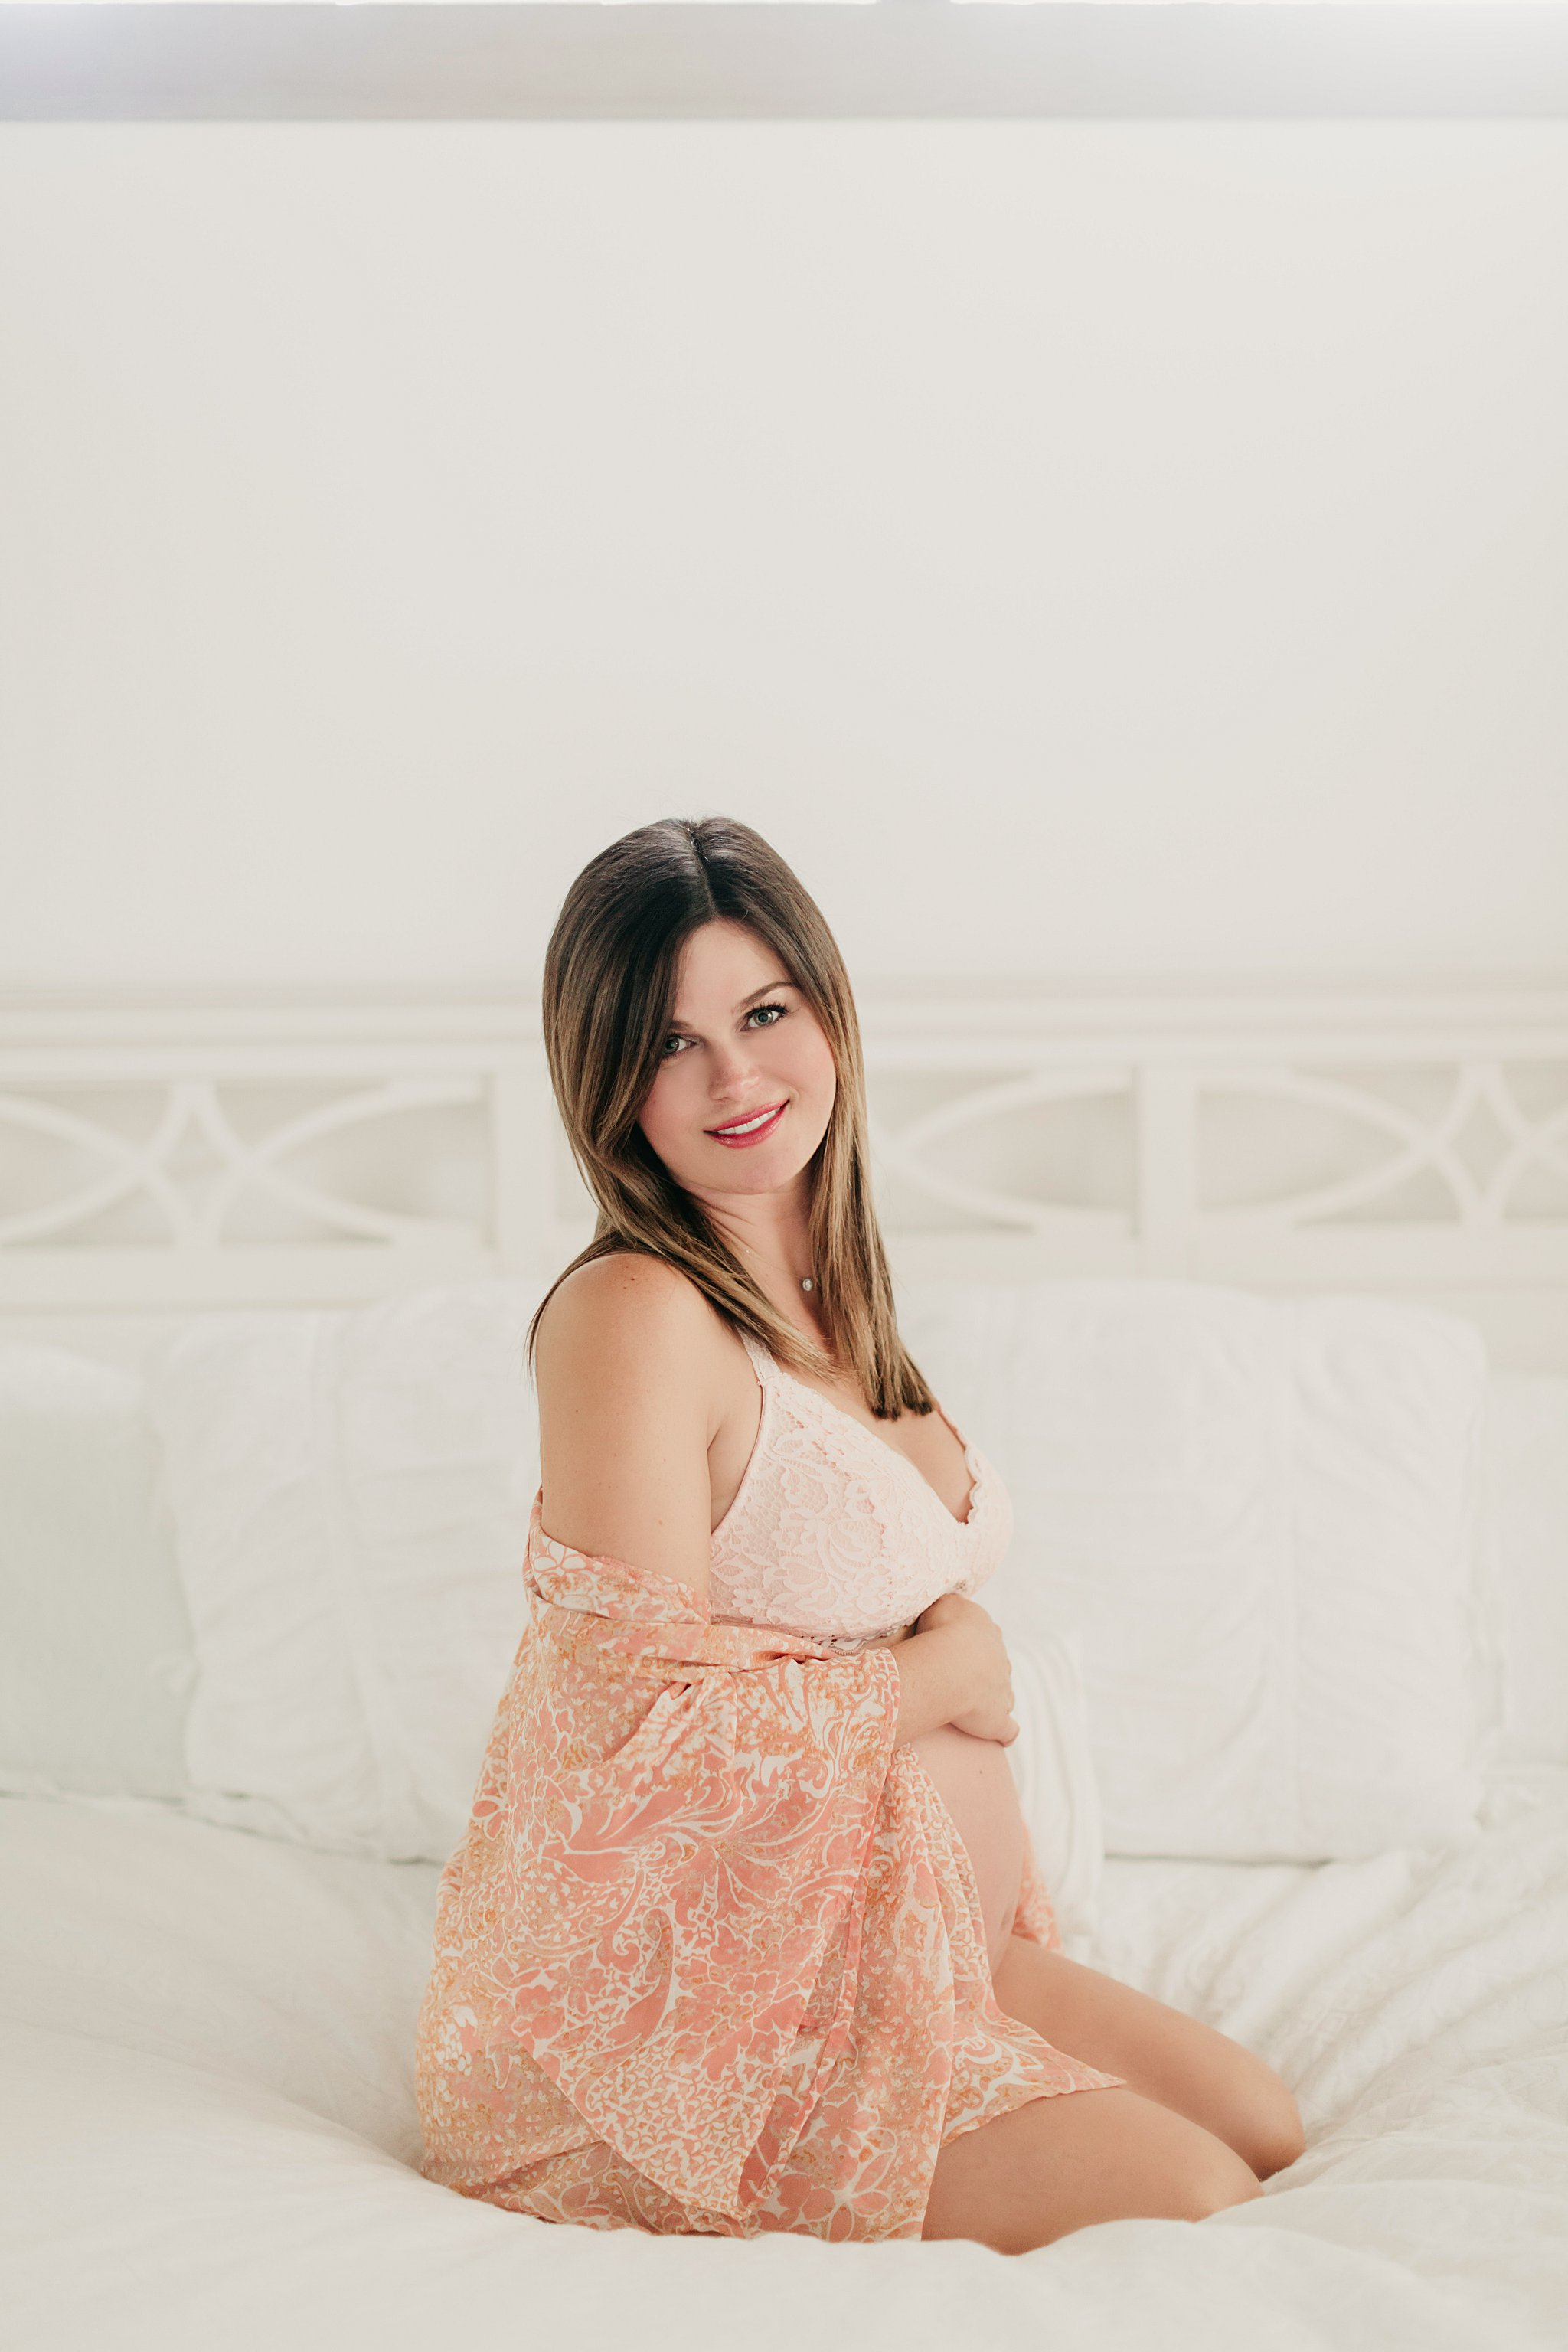 JessicaBordnerPhotography_2971.jpg